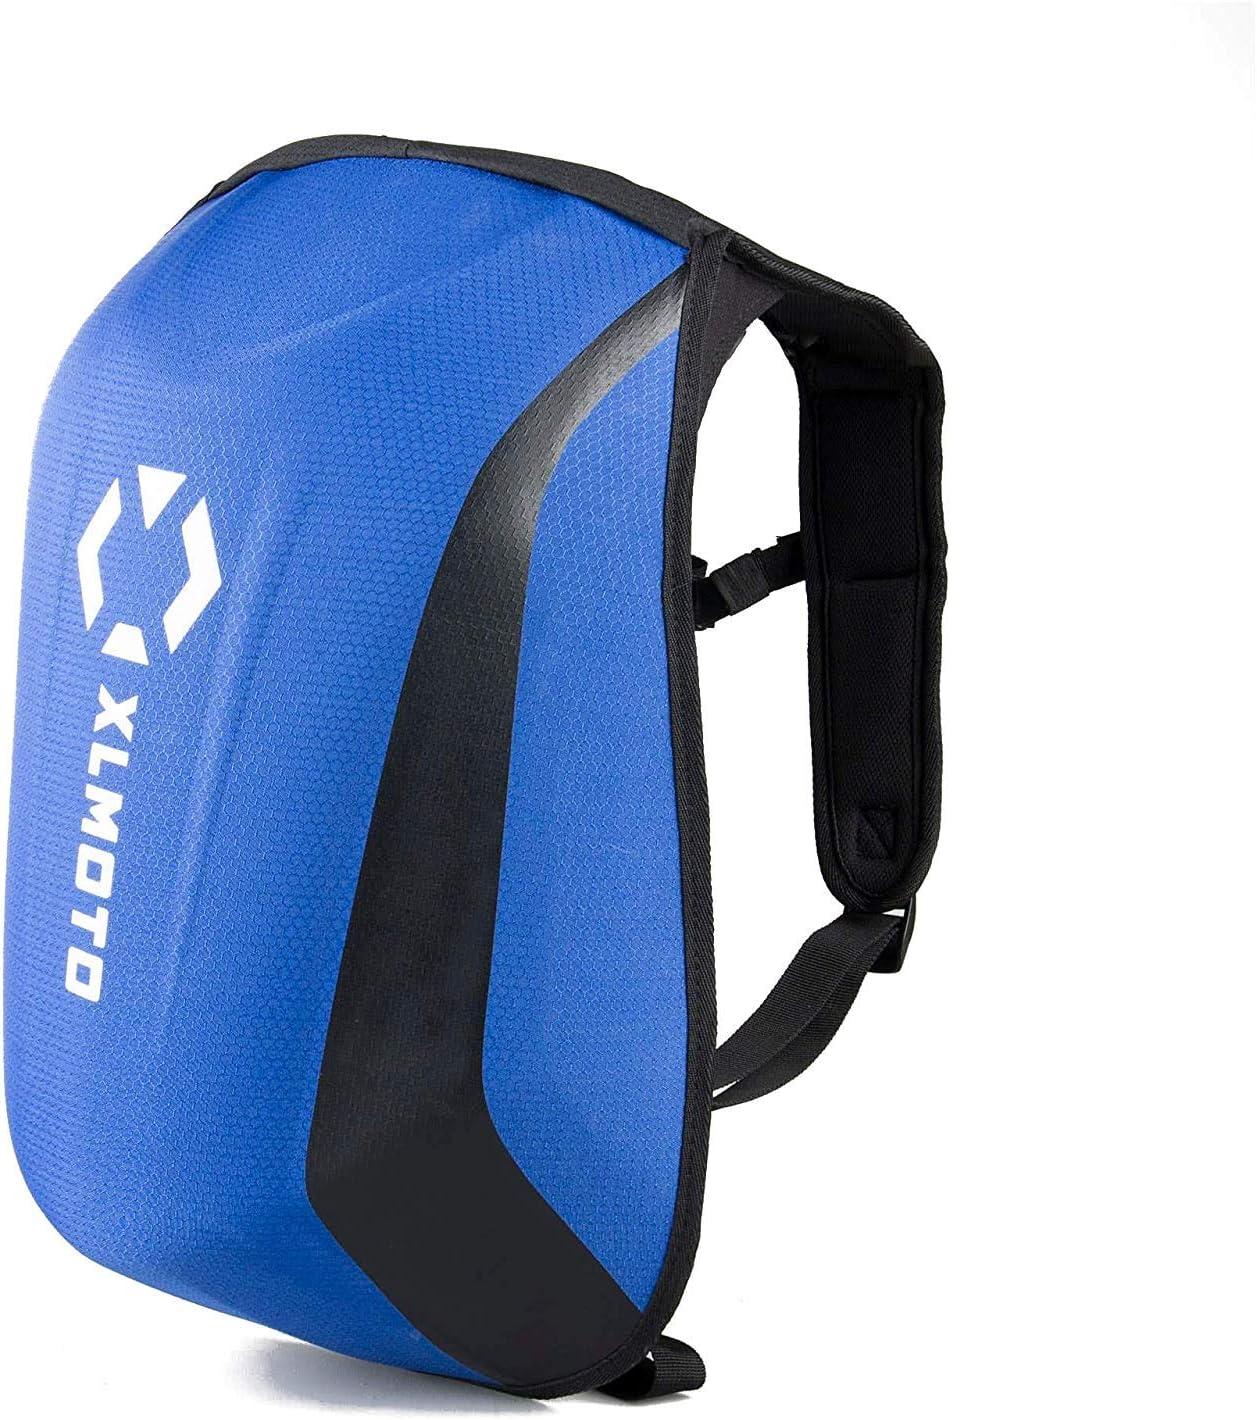 Xlmoto 24l Blue Waterproof Motorcycle Backpack Auto